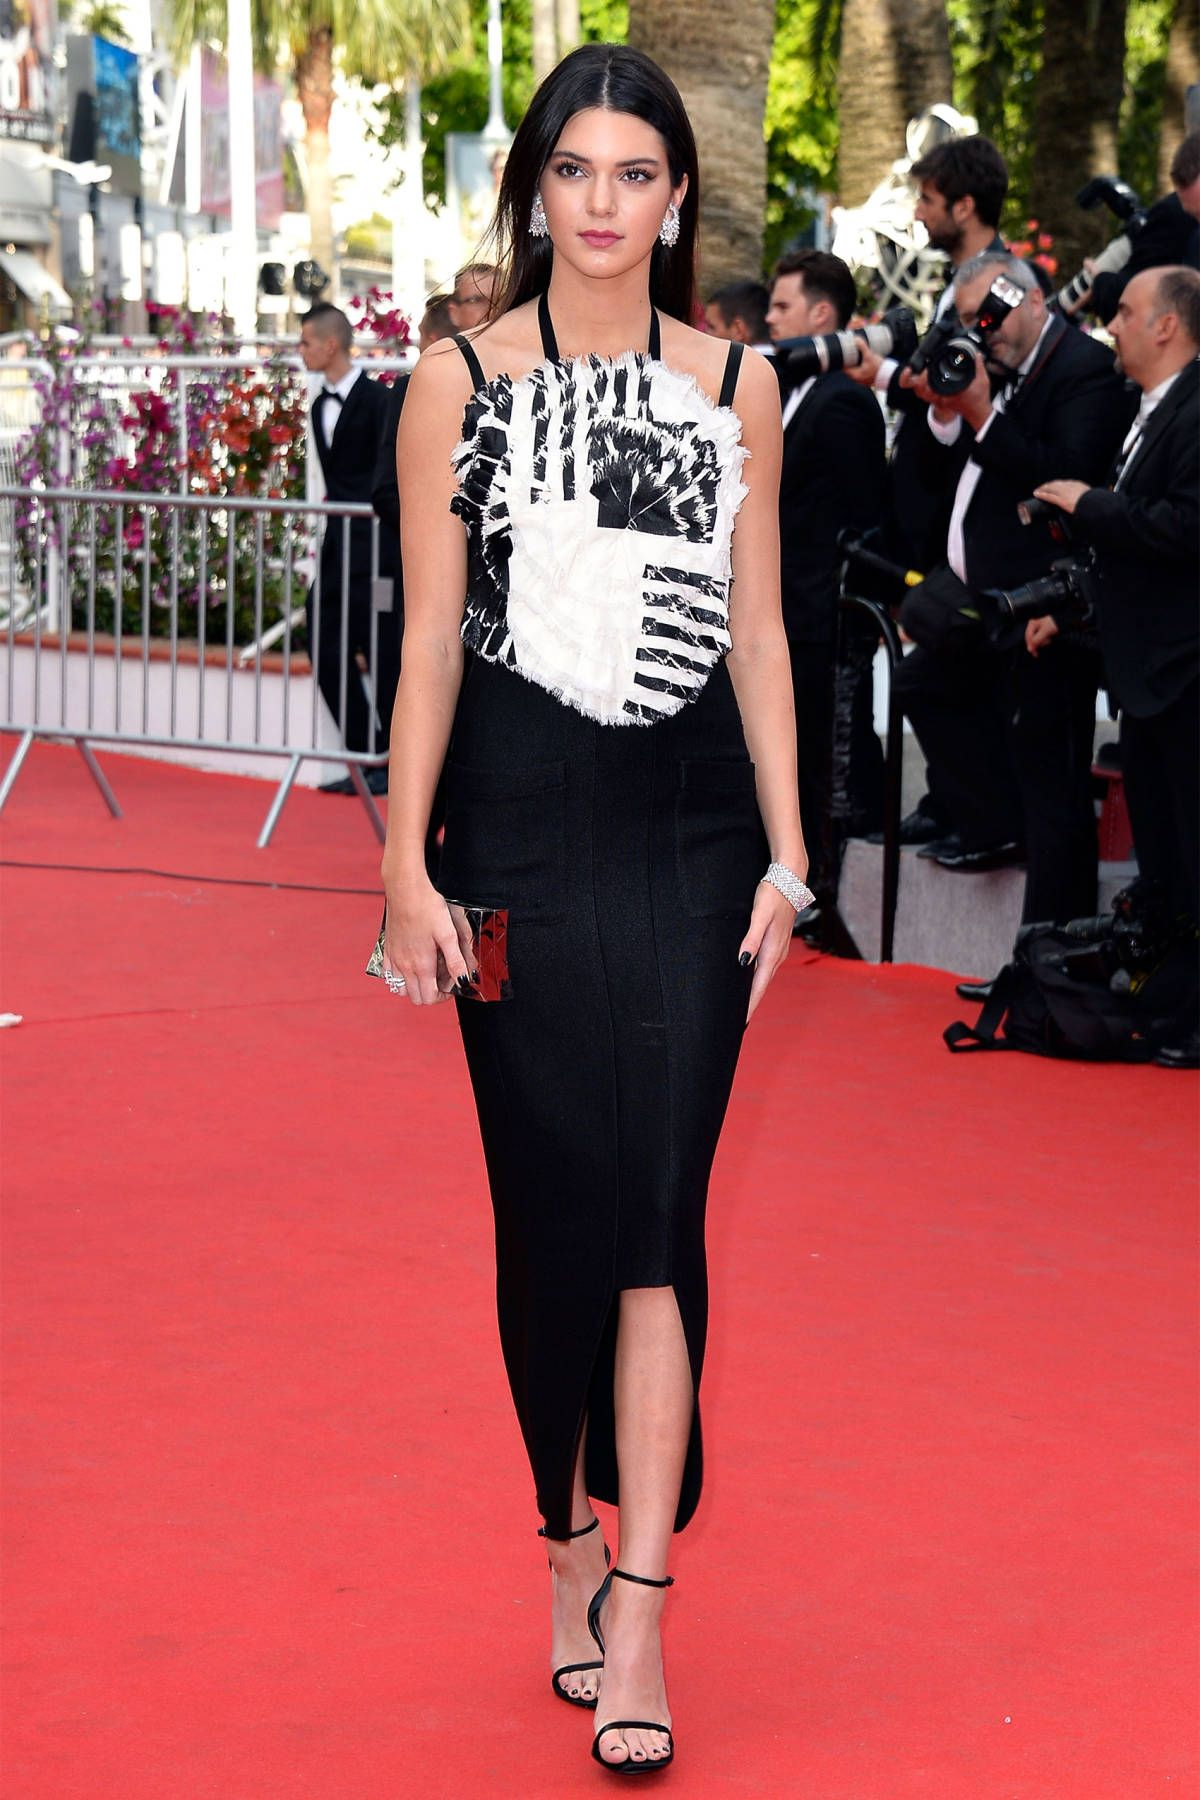 cbab9bbd9a2 Kendall Jenner Red Carpet Style - Kim Kardashian s Sister Kendall Jenner  Style